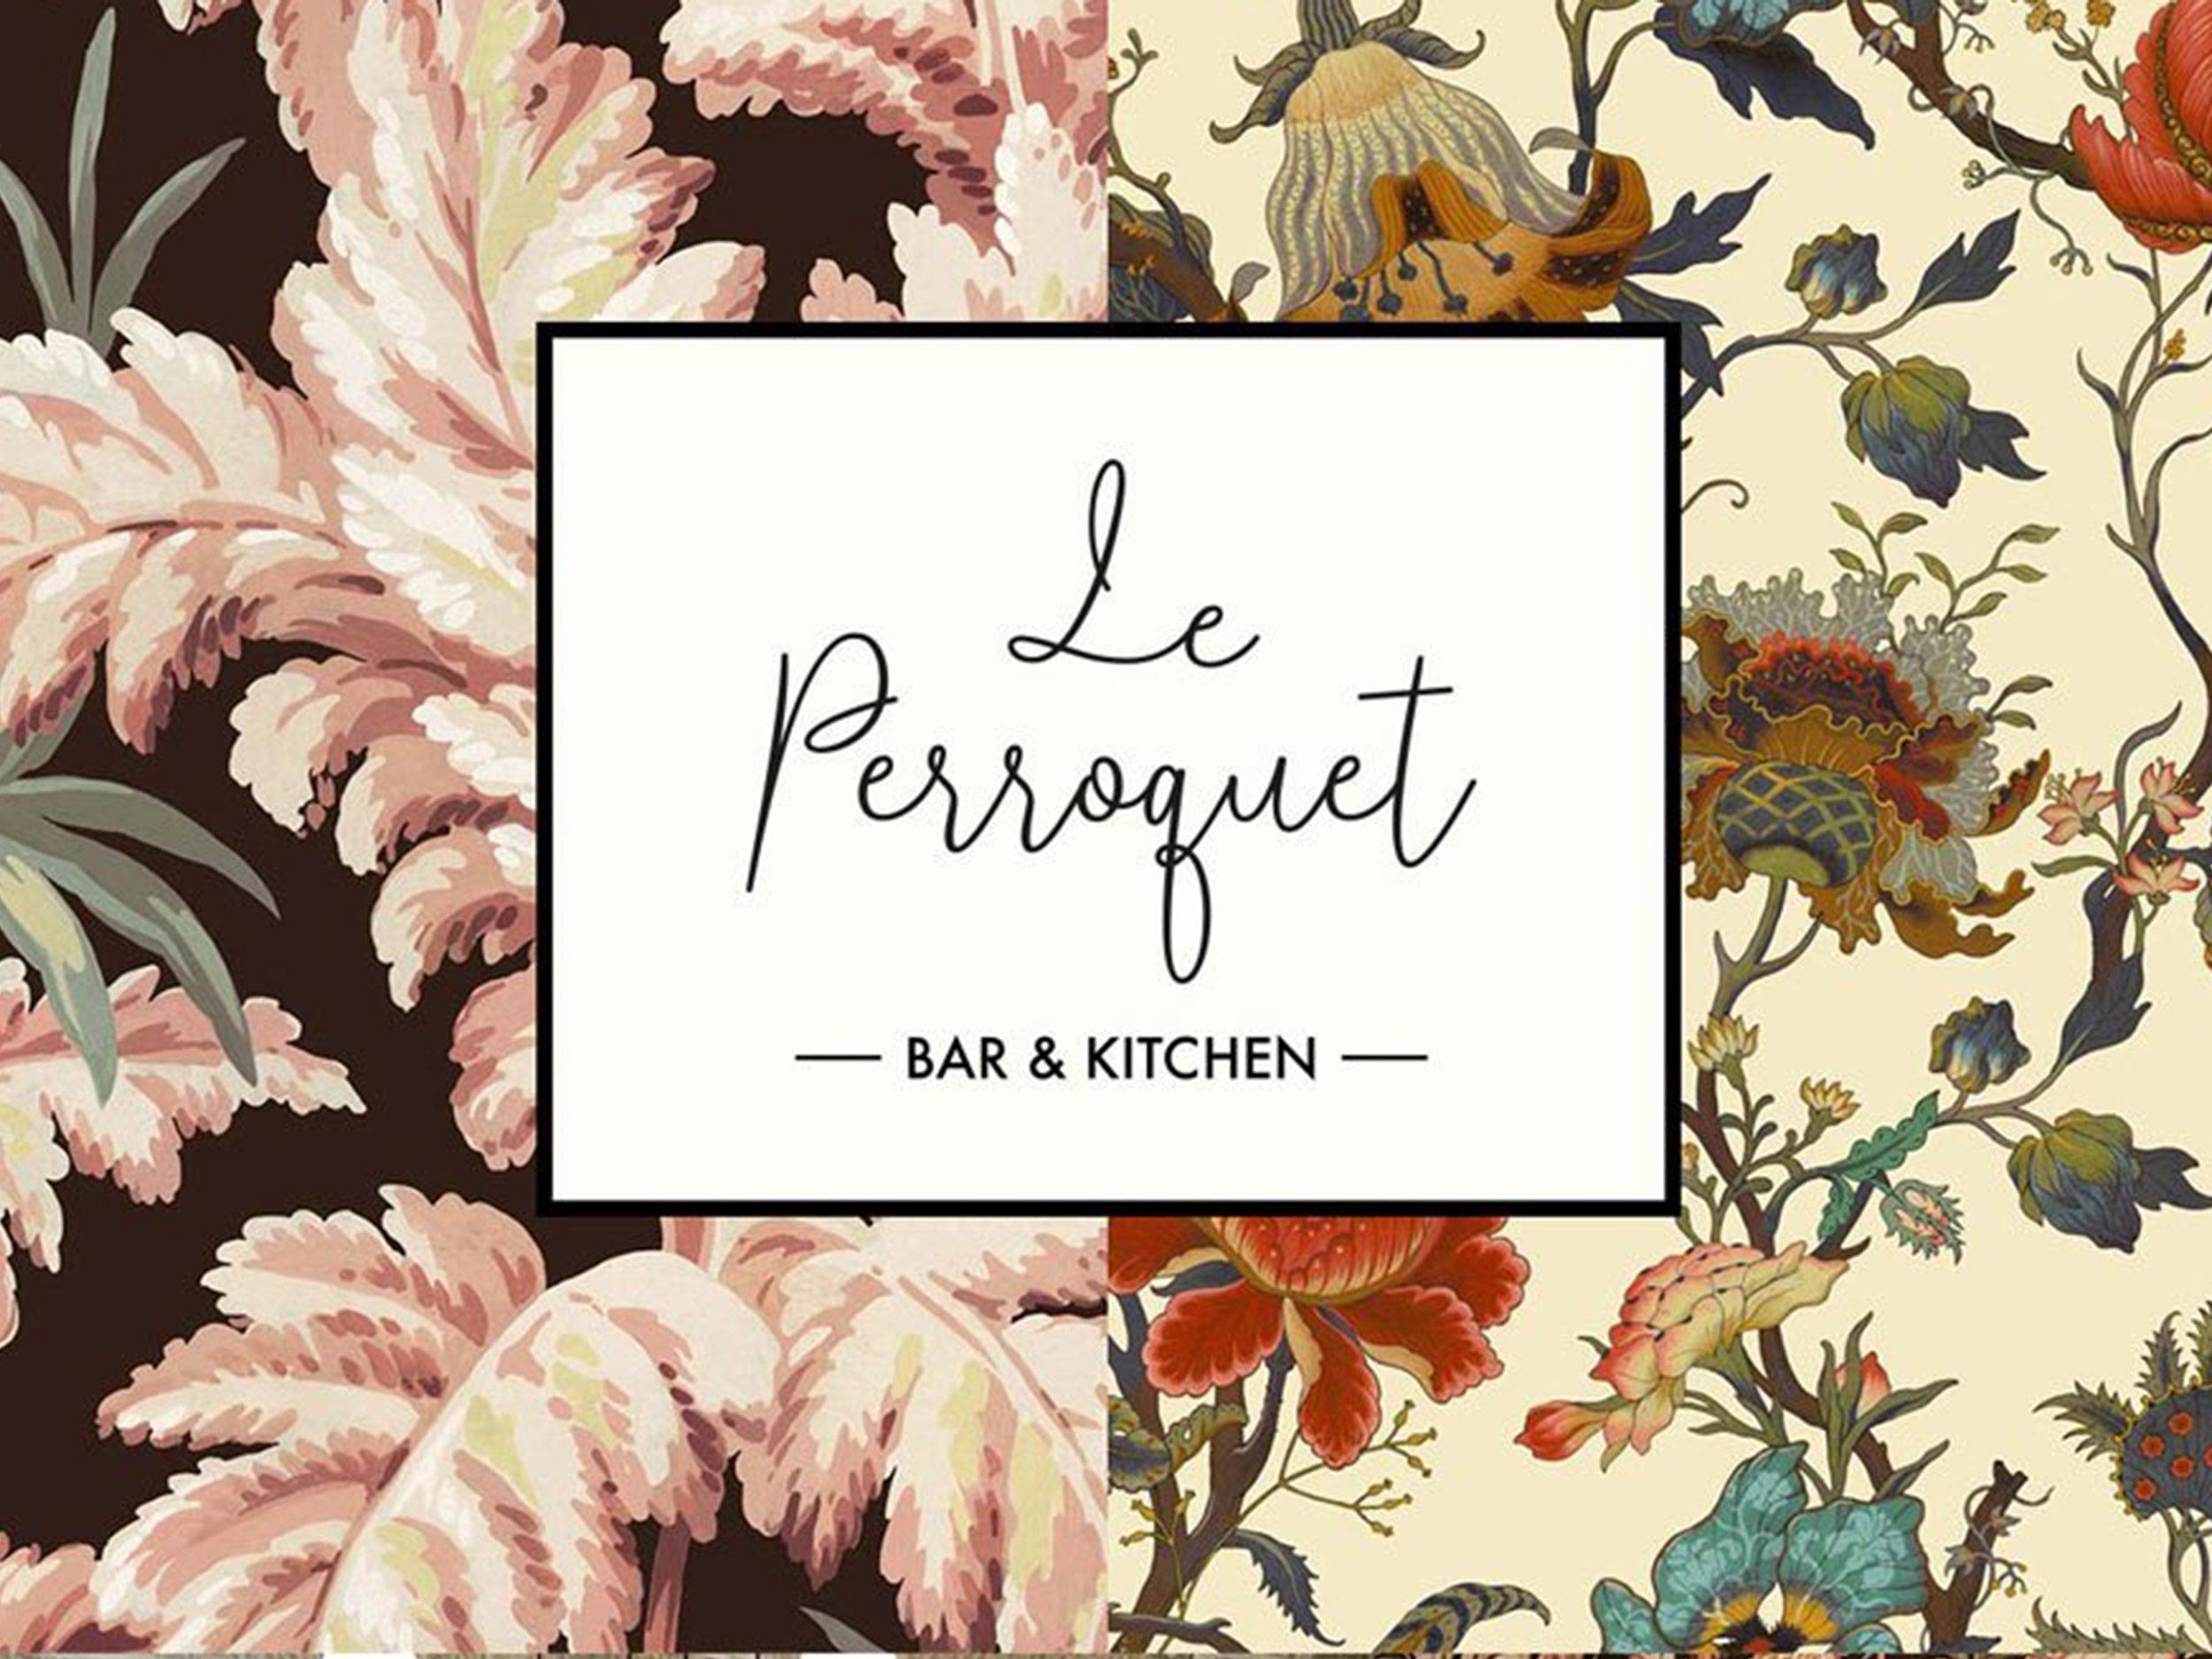 Perroquet-bar-identity-1.jpg